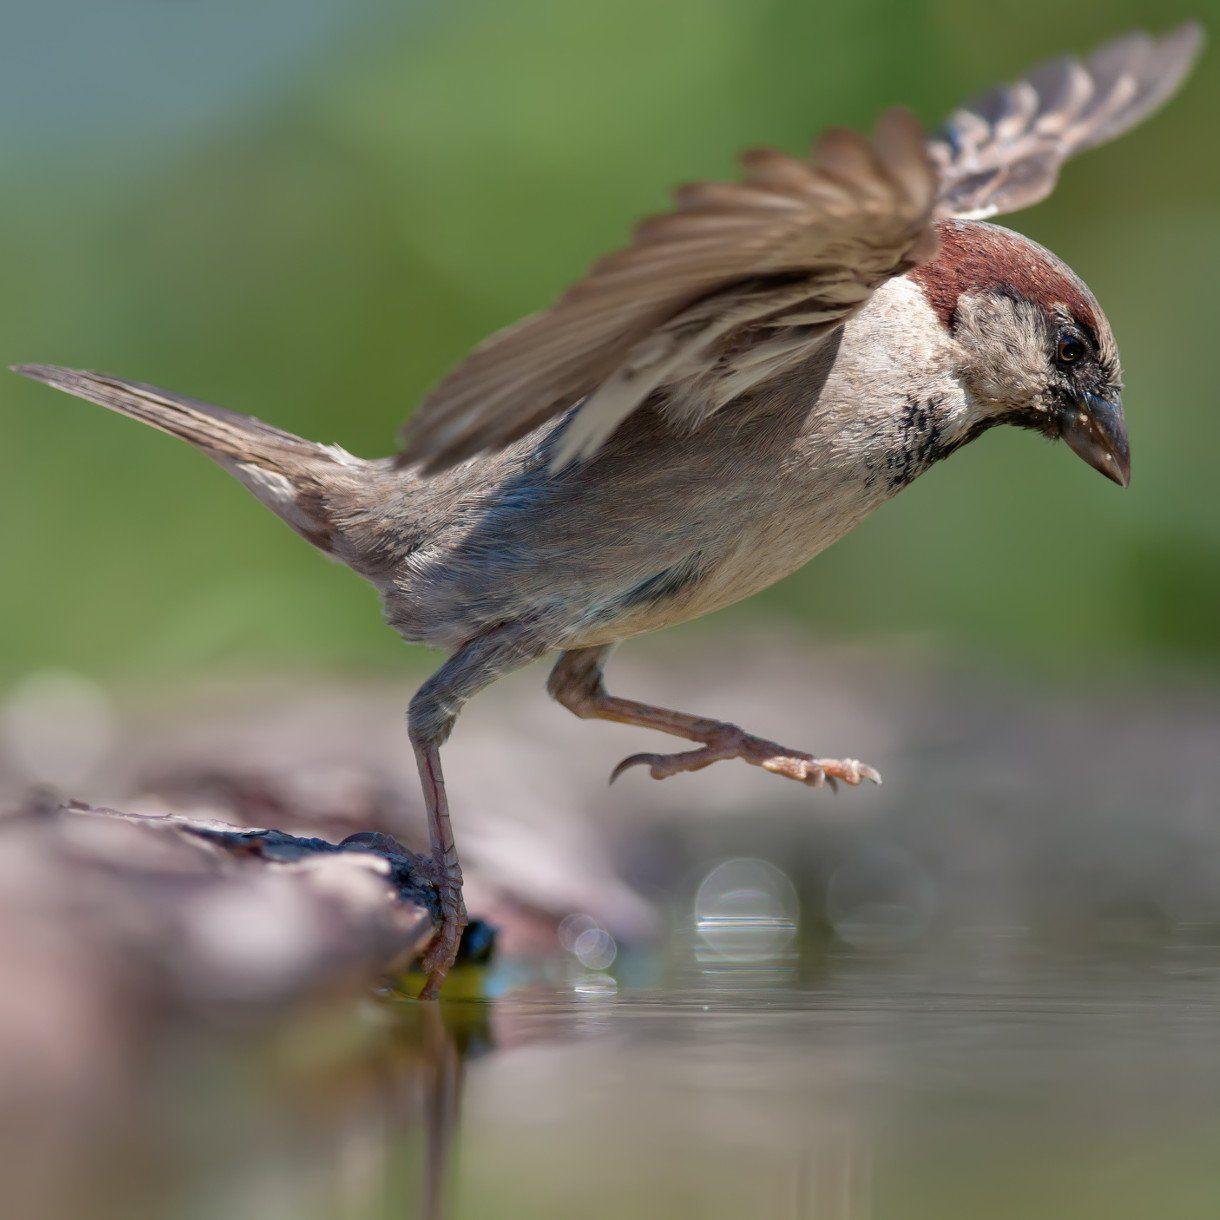 All about the house sparrow spatz raufbold pilger